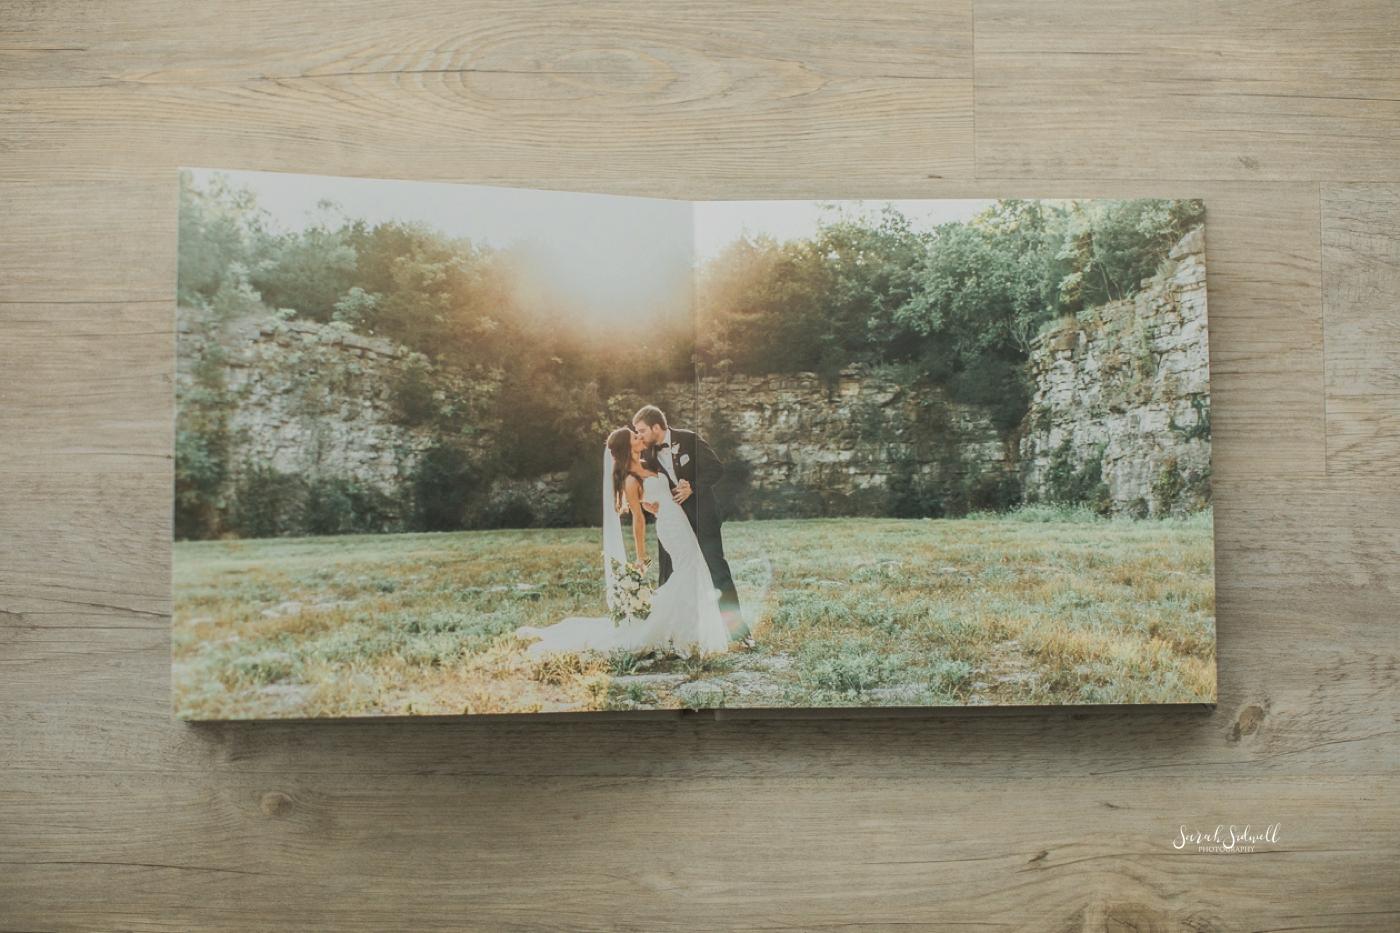 Greystone Quarry Wedding | Sarah Sidwell Photography